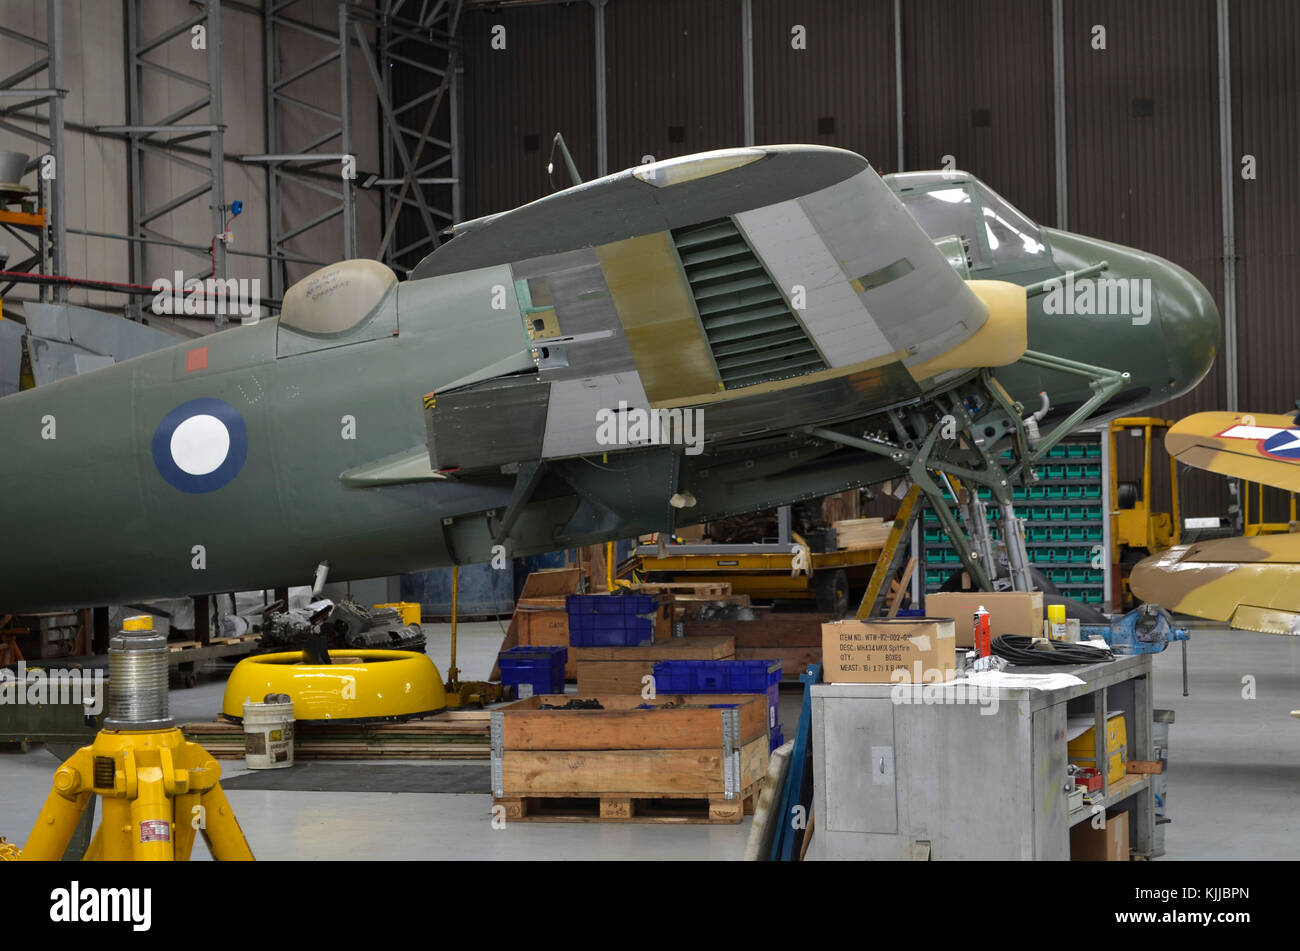 Bristol Beaufighter XIC in RAAF colours undergoing restoration, Duxford, UK. - Stock Image